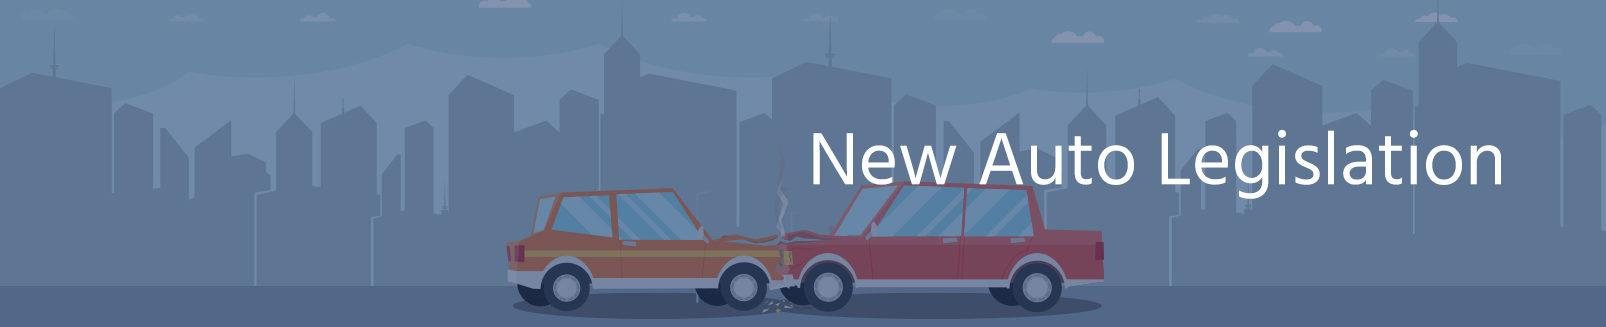 new auto legislation